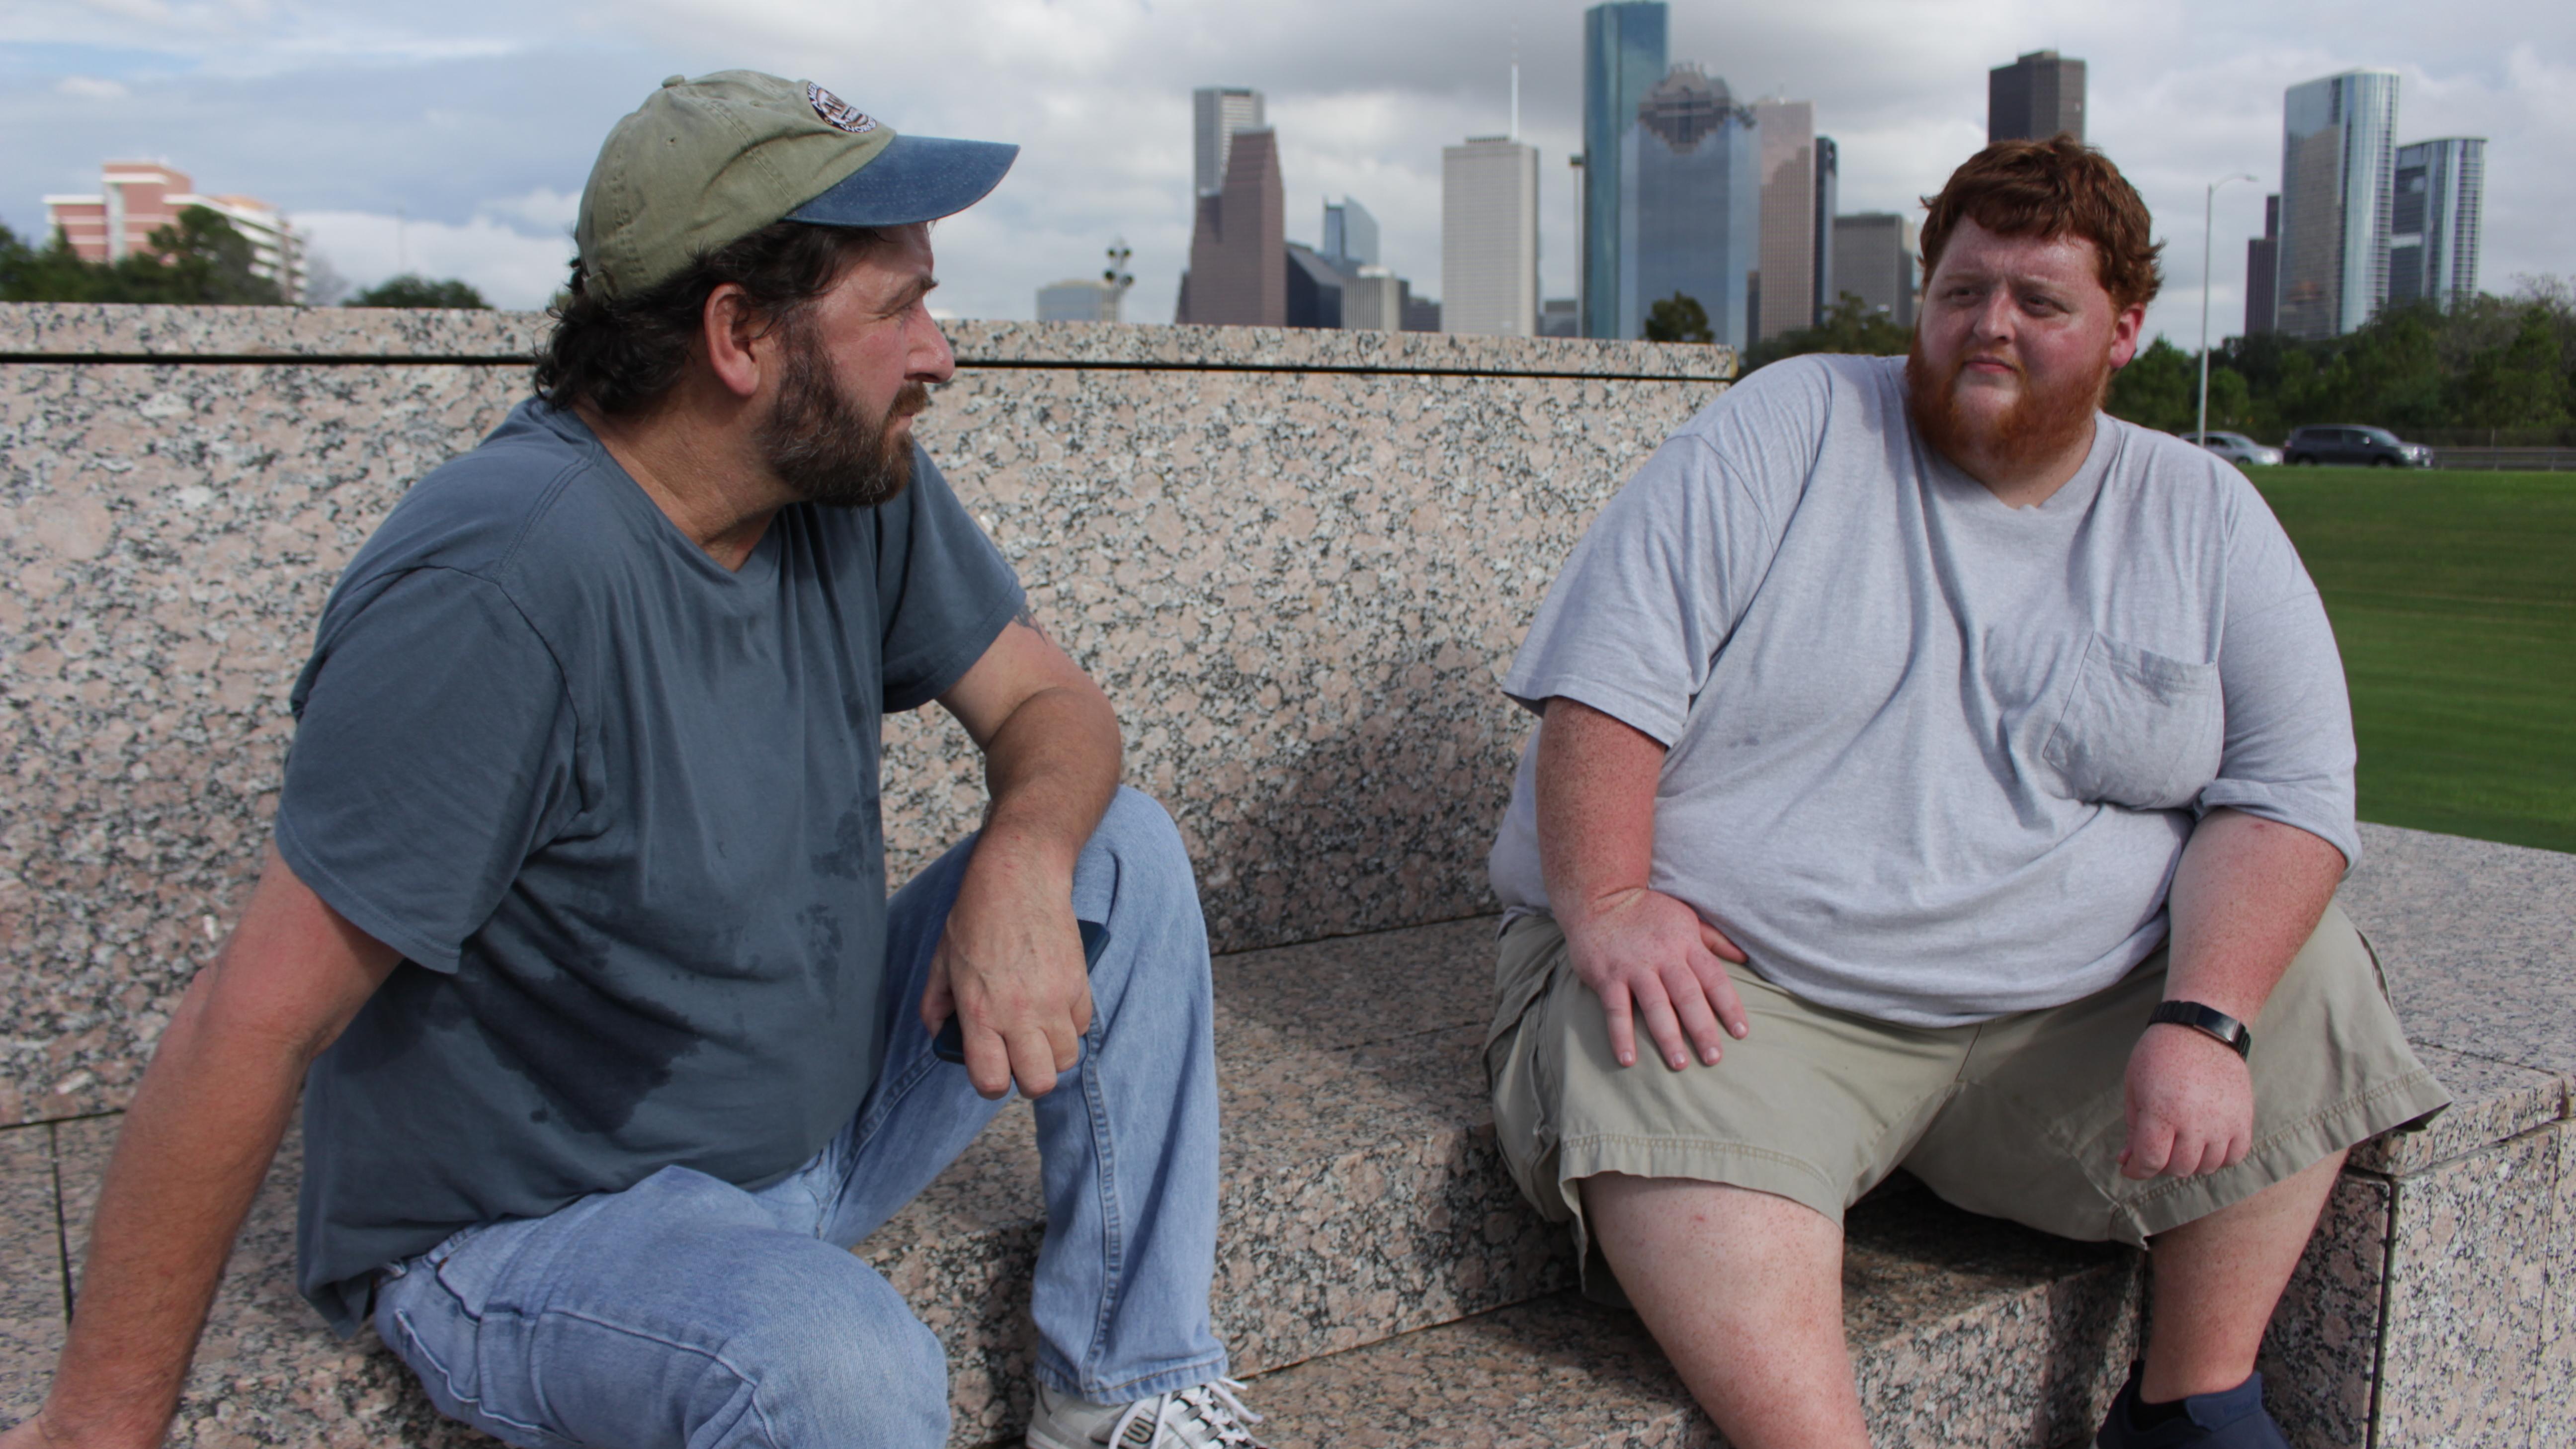 my 600 pound life david and benji full episode